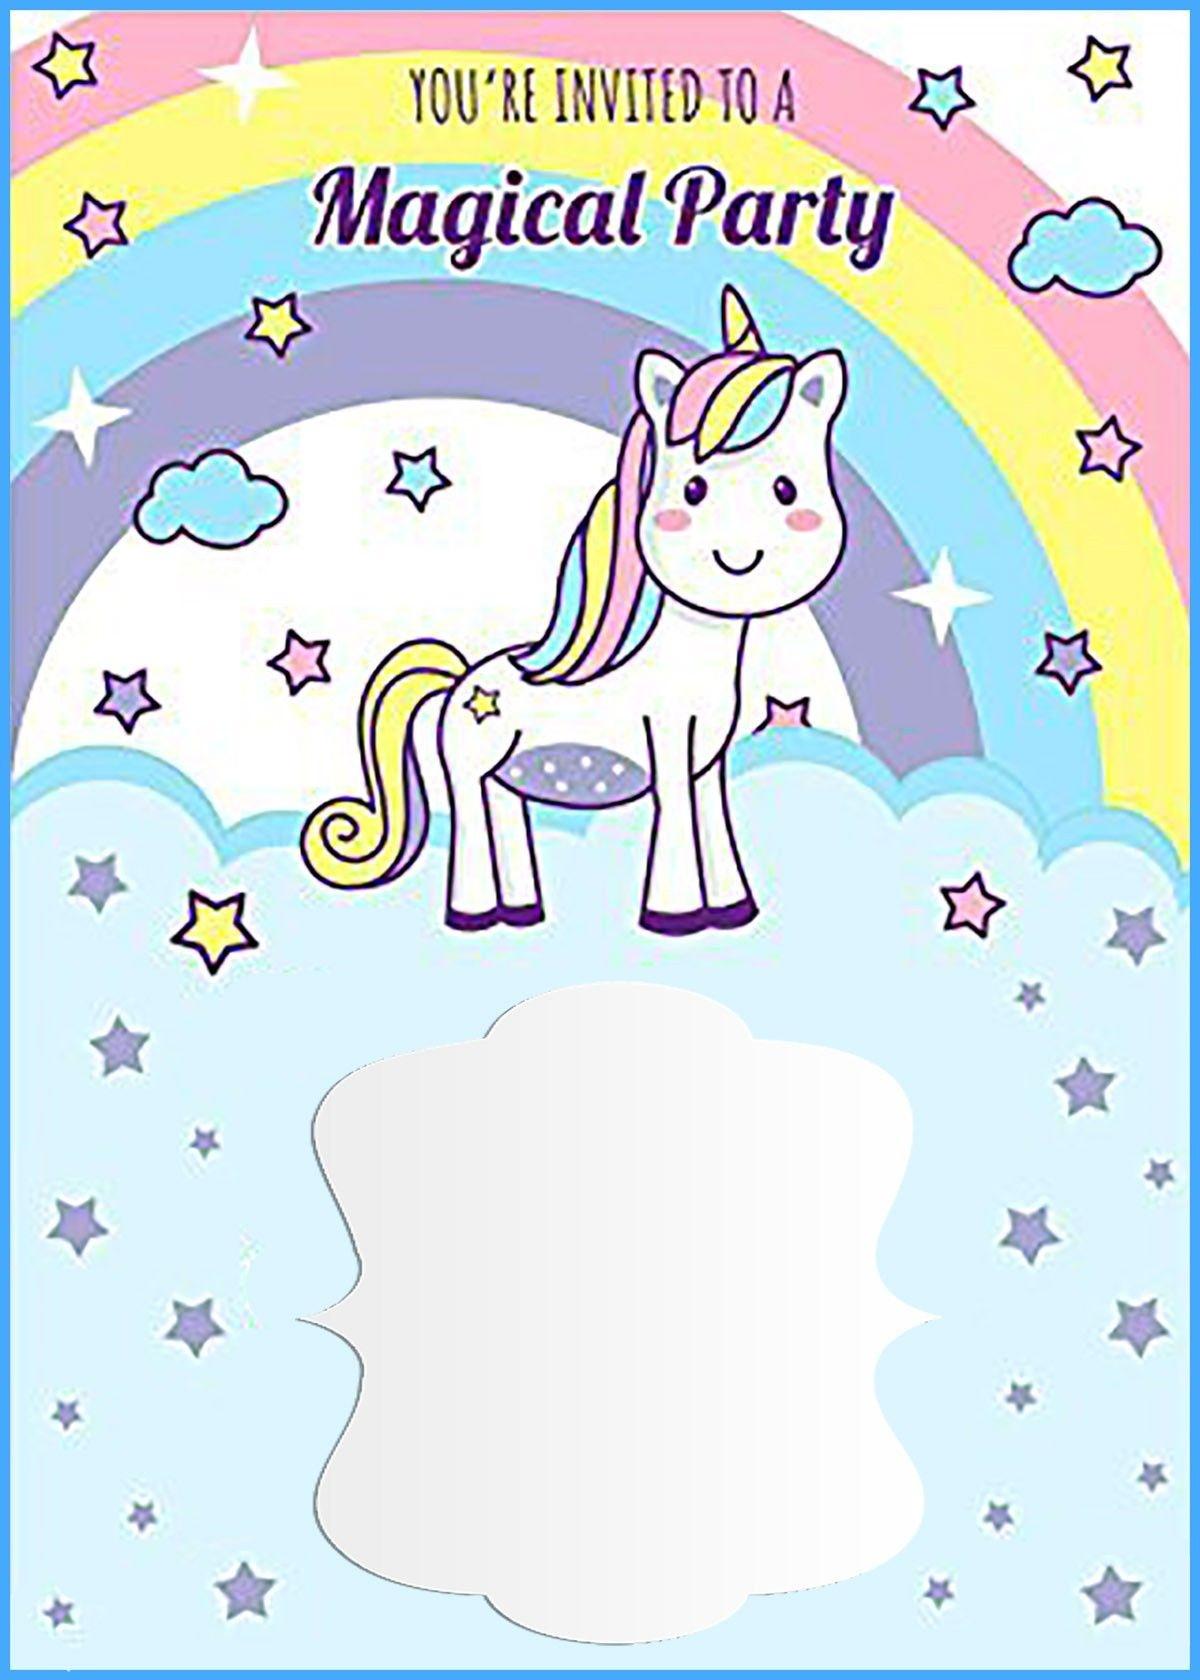 Unicorn Free Printable First Birthday Invitation Template - Free Printable Unicorn Invitations